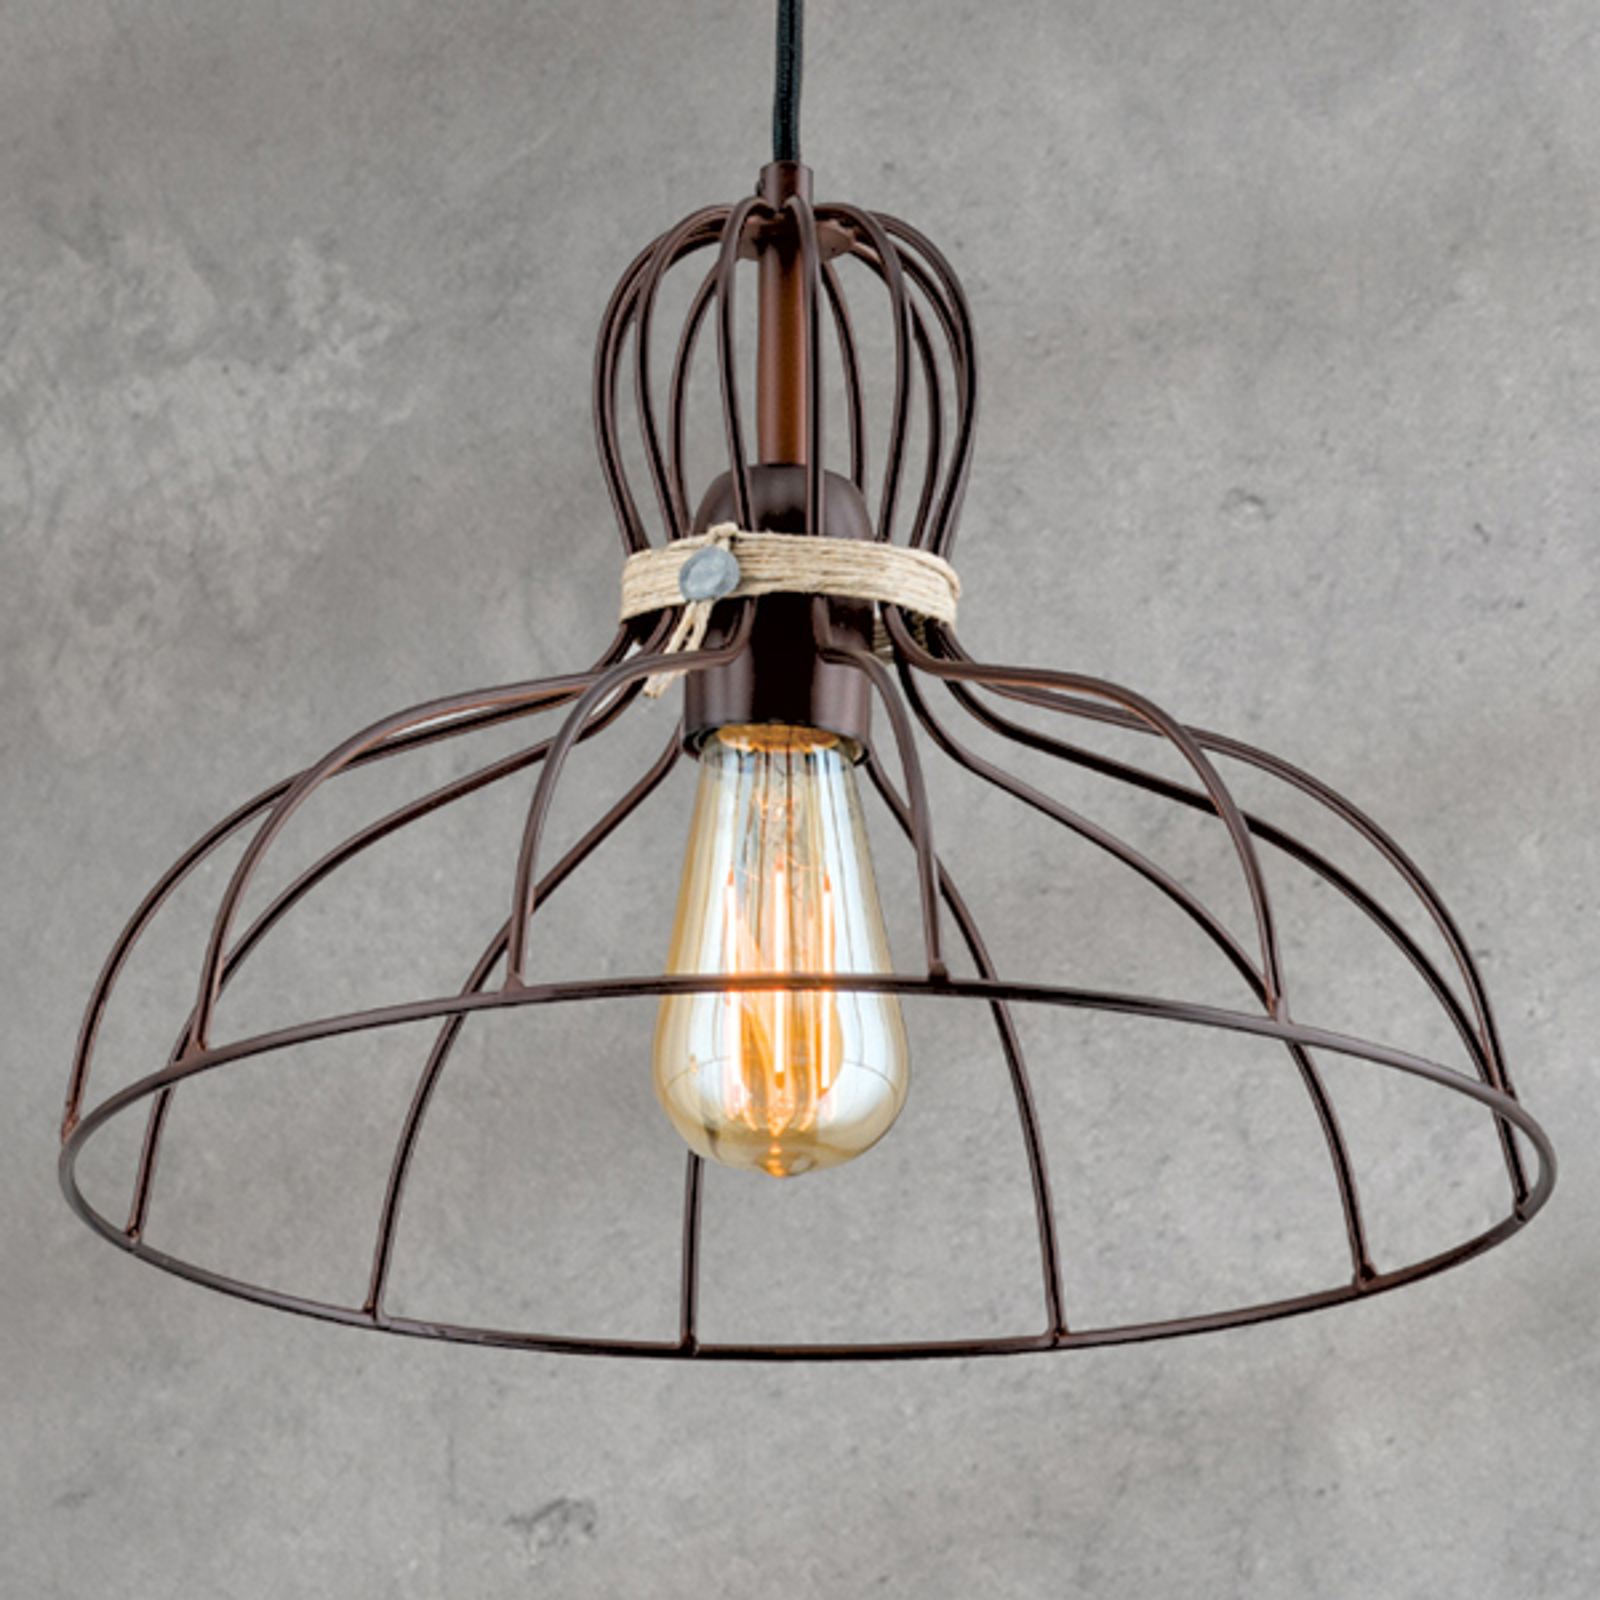 Lampa wisząca Dilip - urok vintage